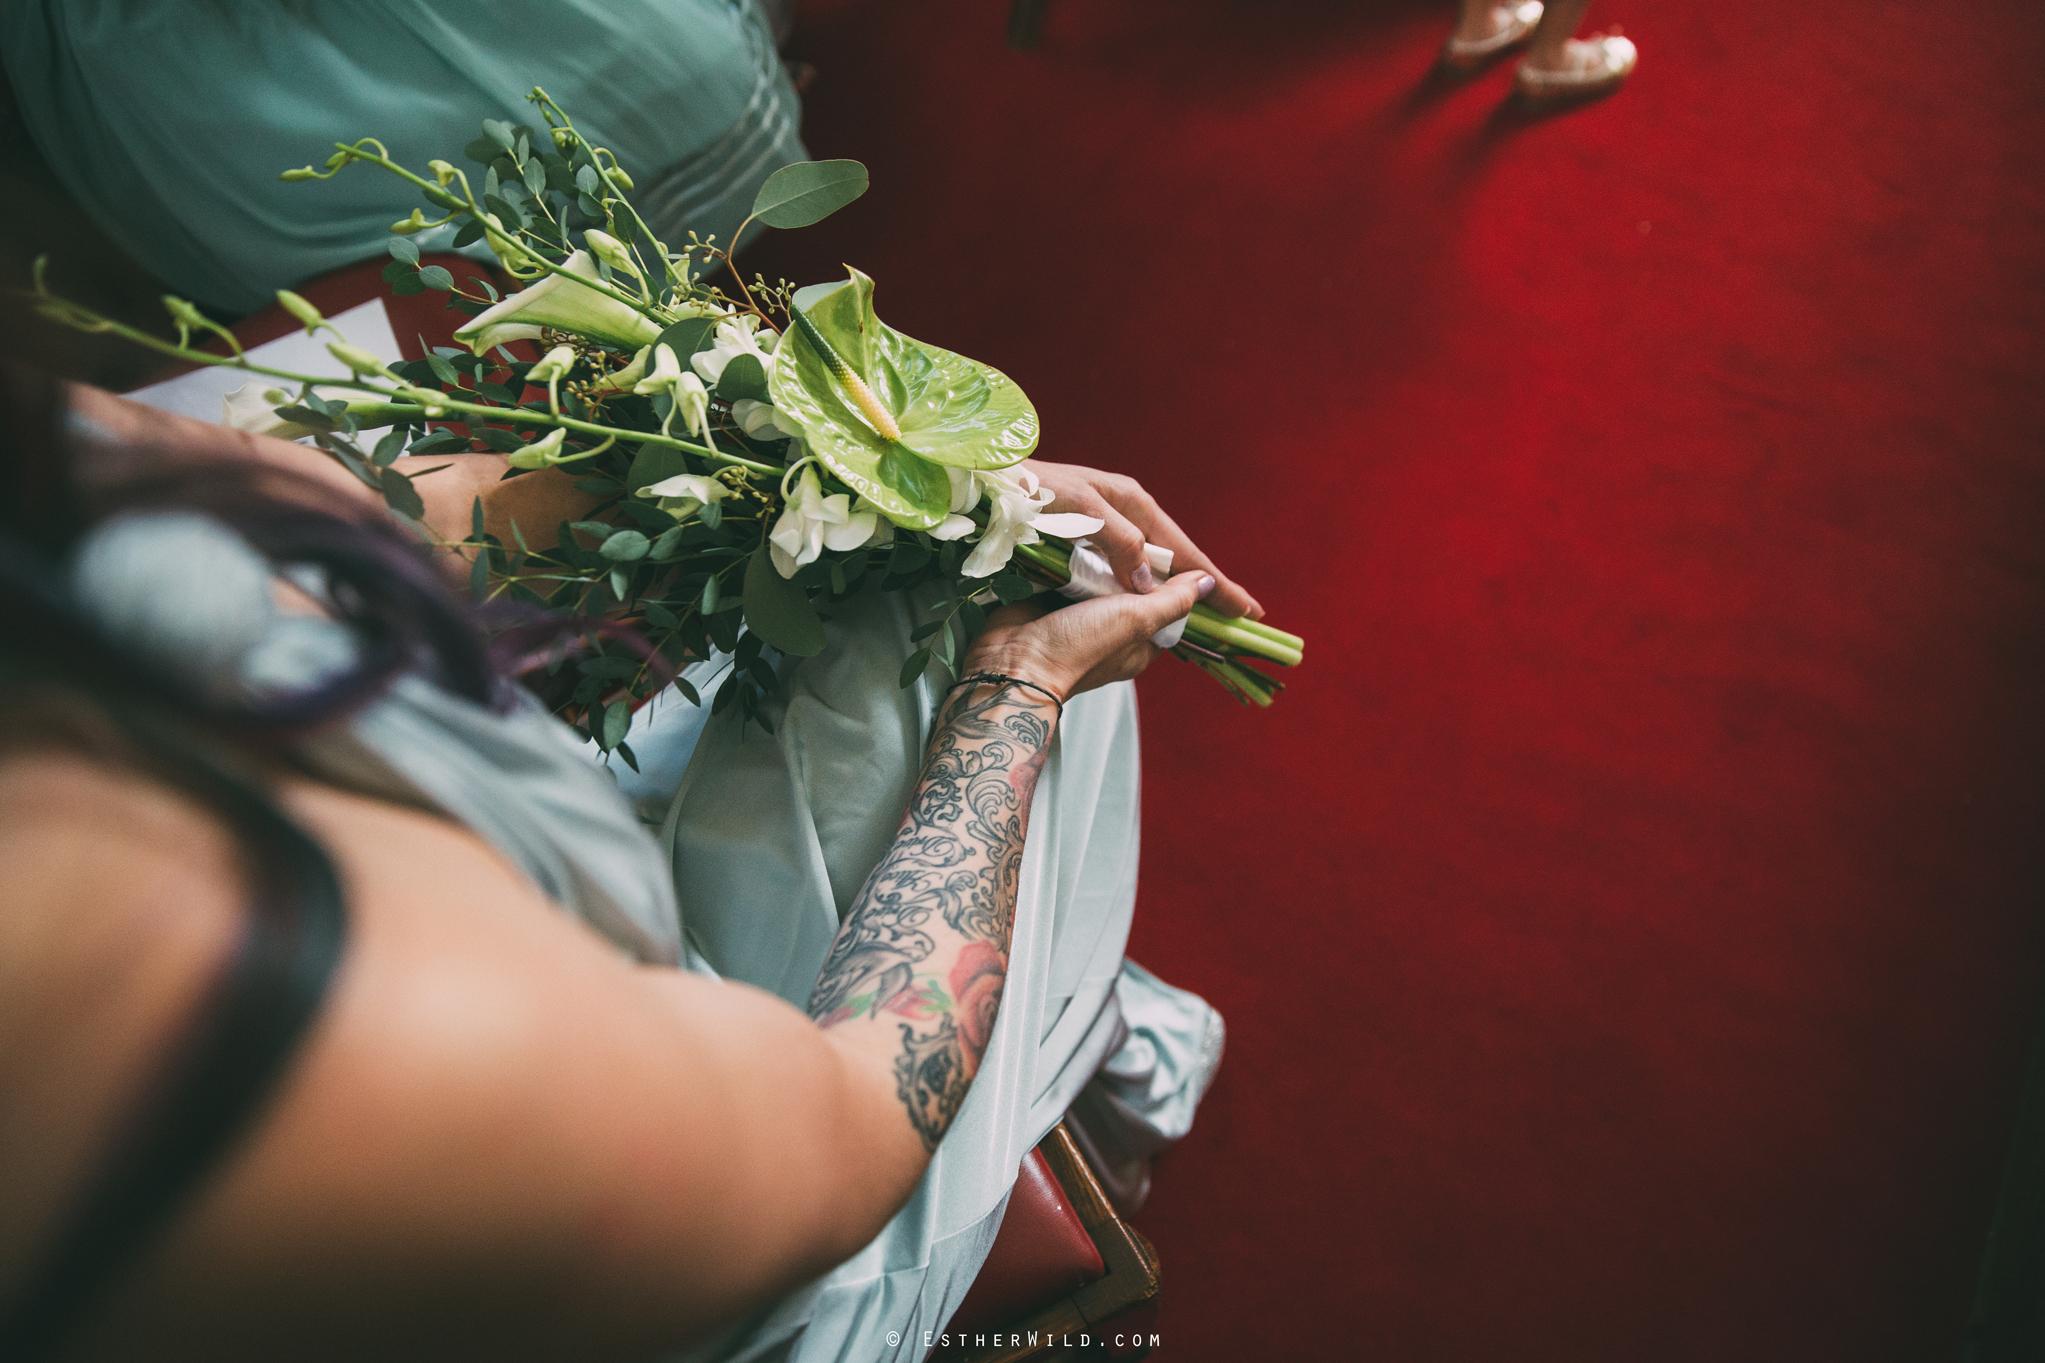 Islington_Town_Hall_Wedding_London_Photographer_Esther_Wild_IMG_5025.jpg